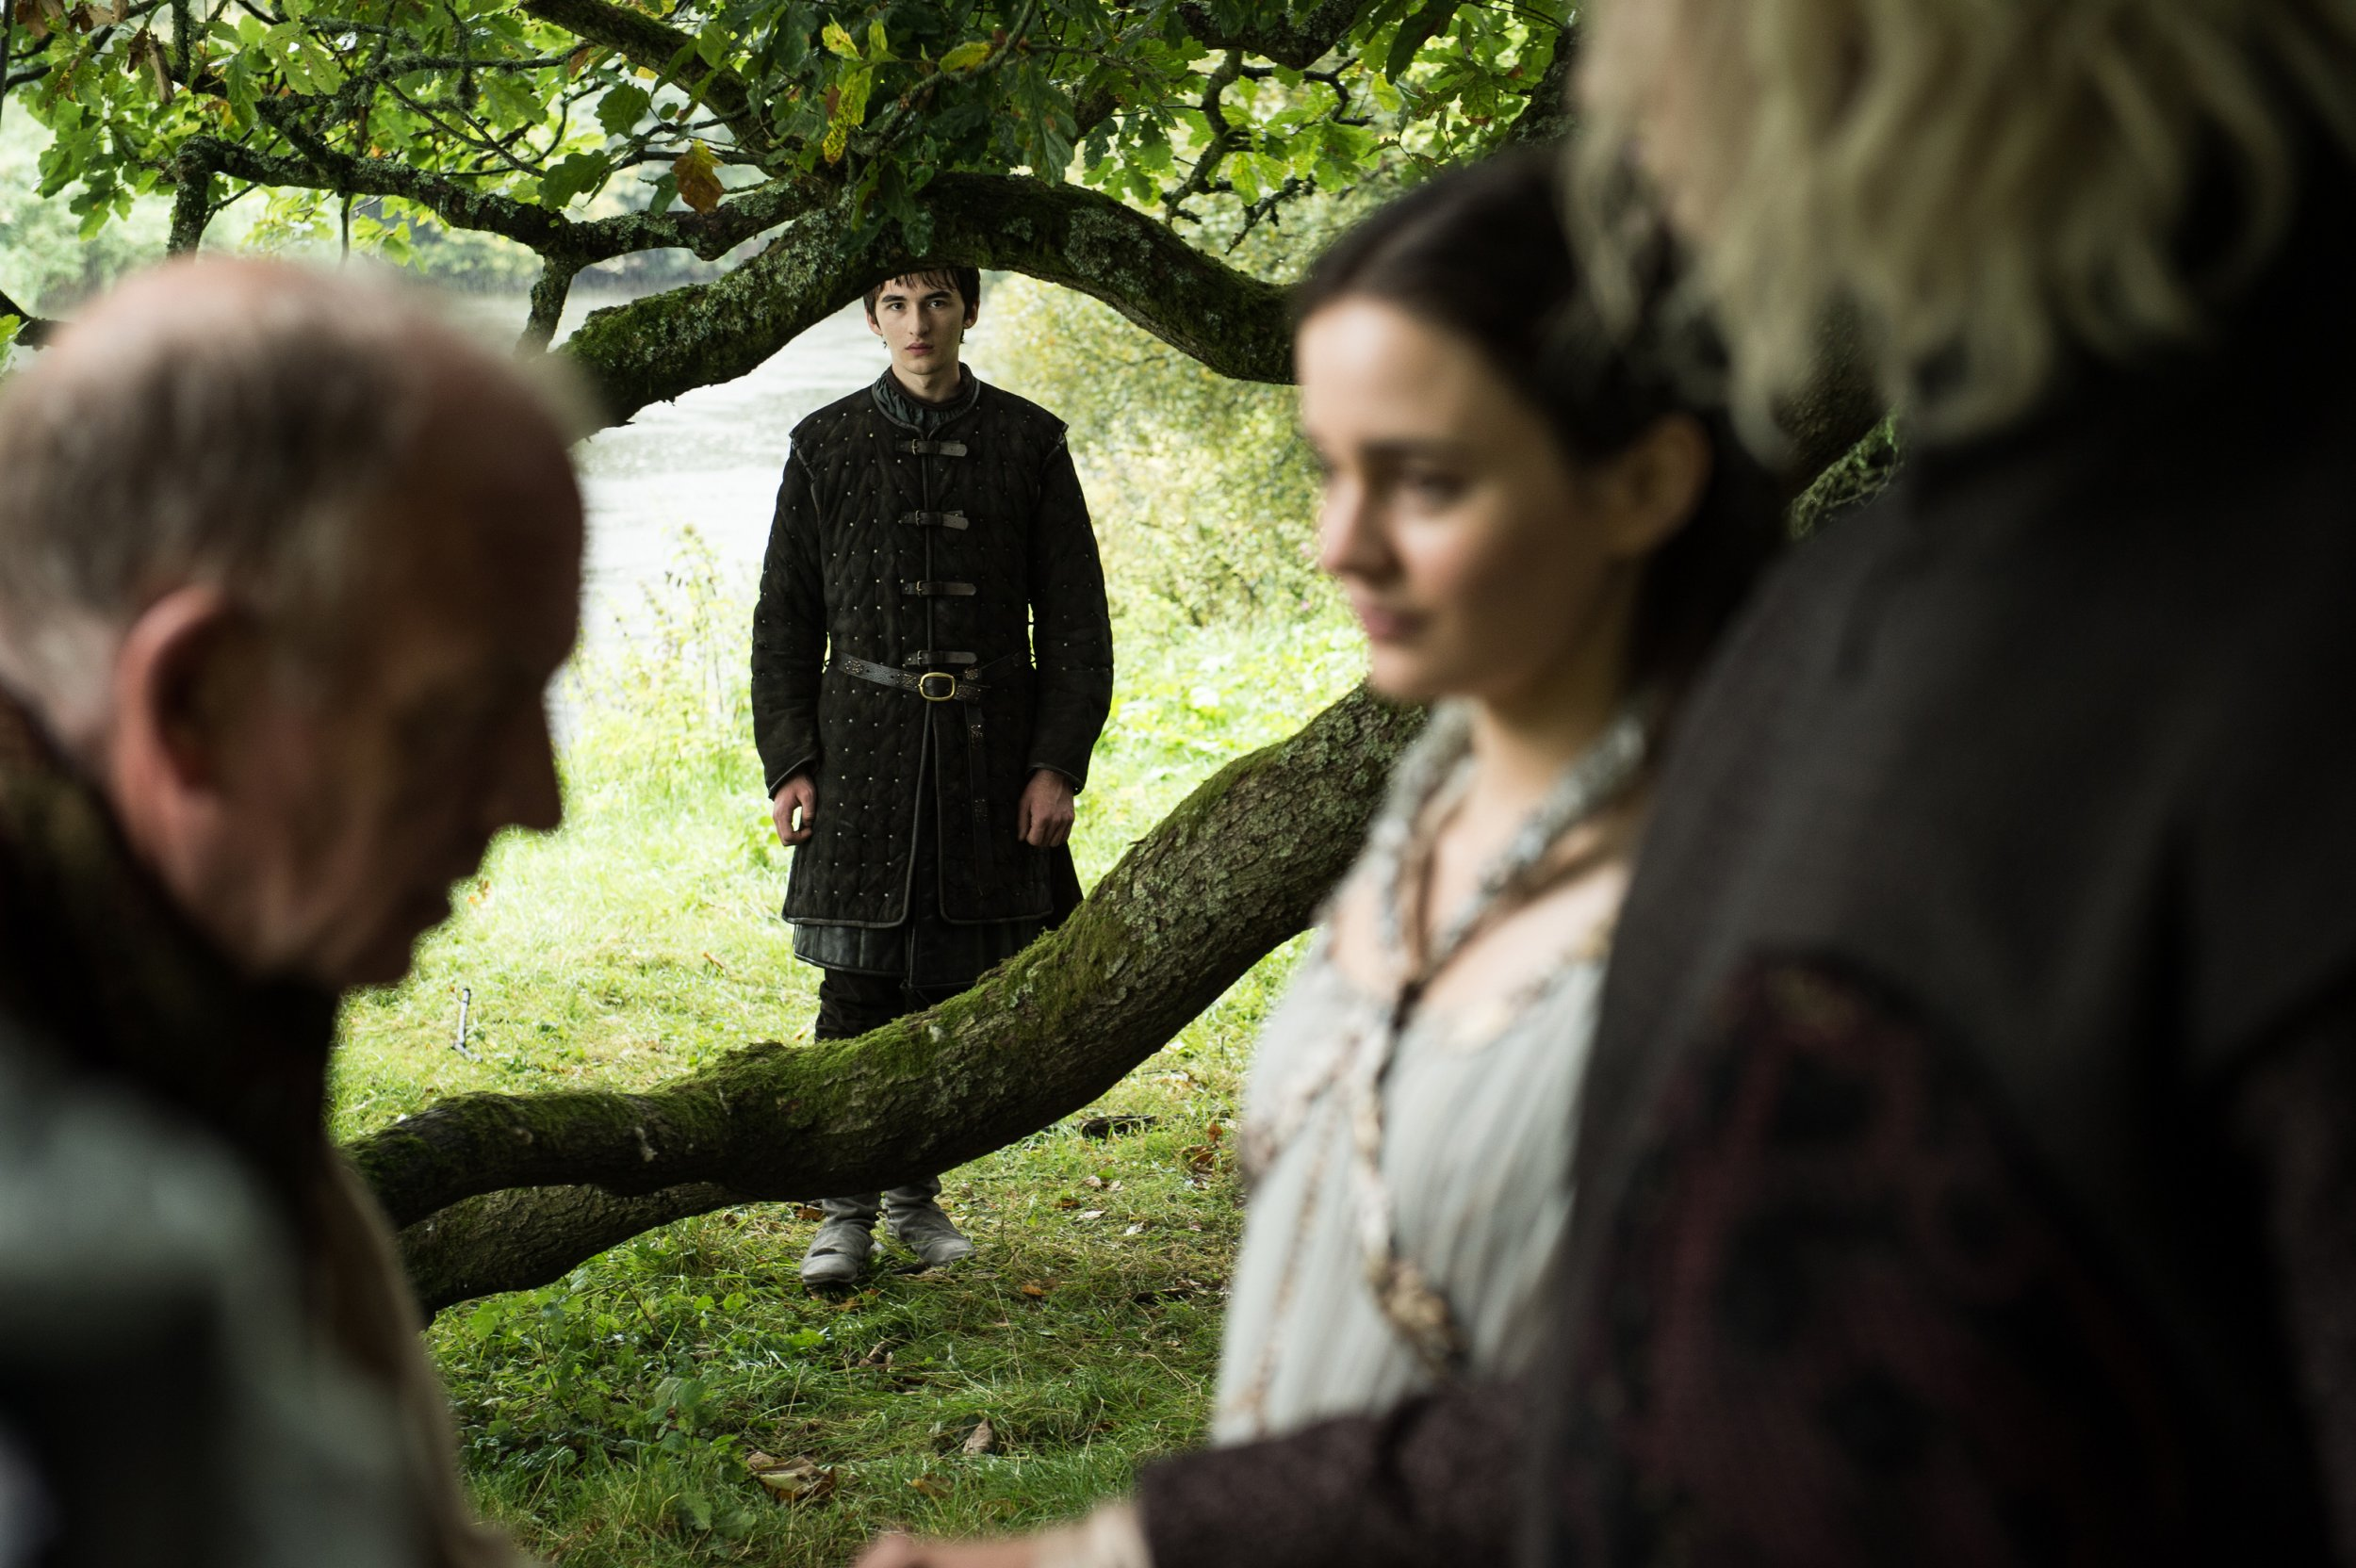 who-is-lyanna-stark-and-rhaegar-targaryen-game-of-thrones-season-8-bran-vision-jon-snow-parents